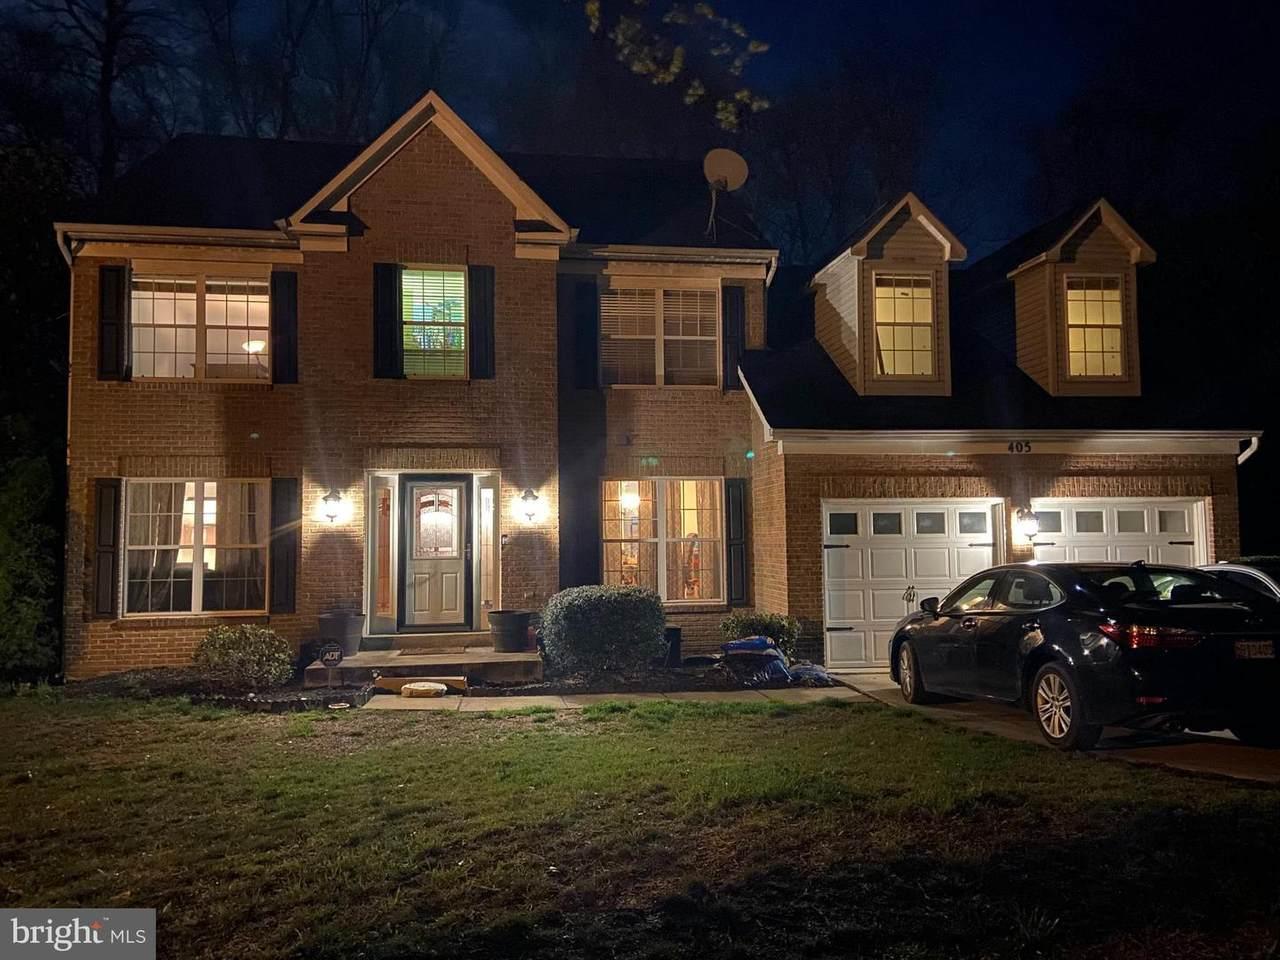 405 Bonhill Drive - Photo 1